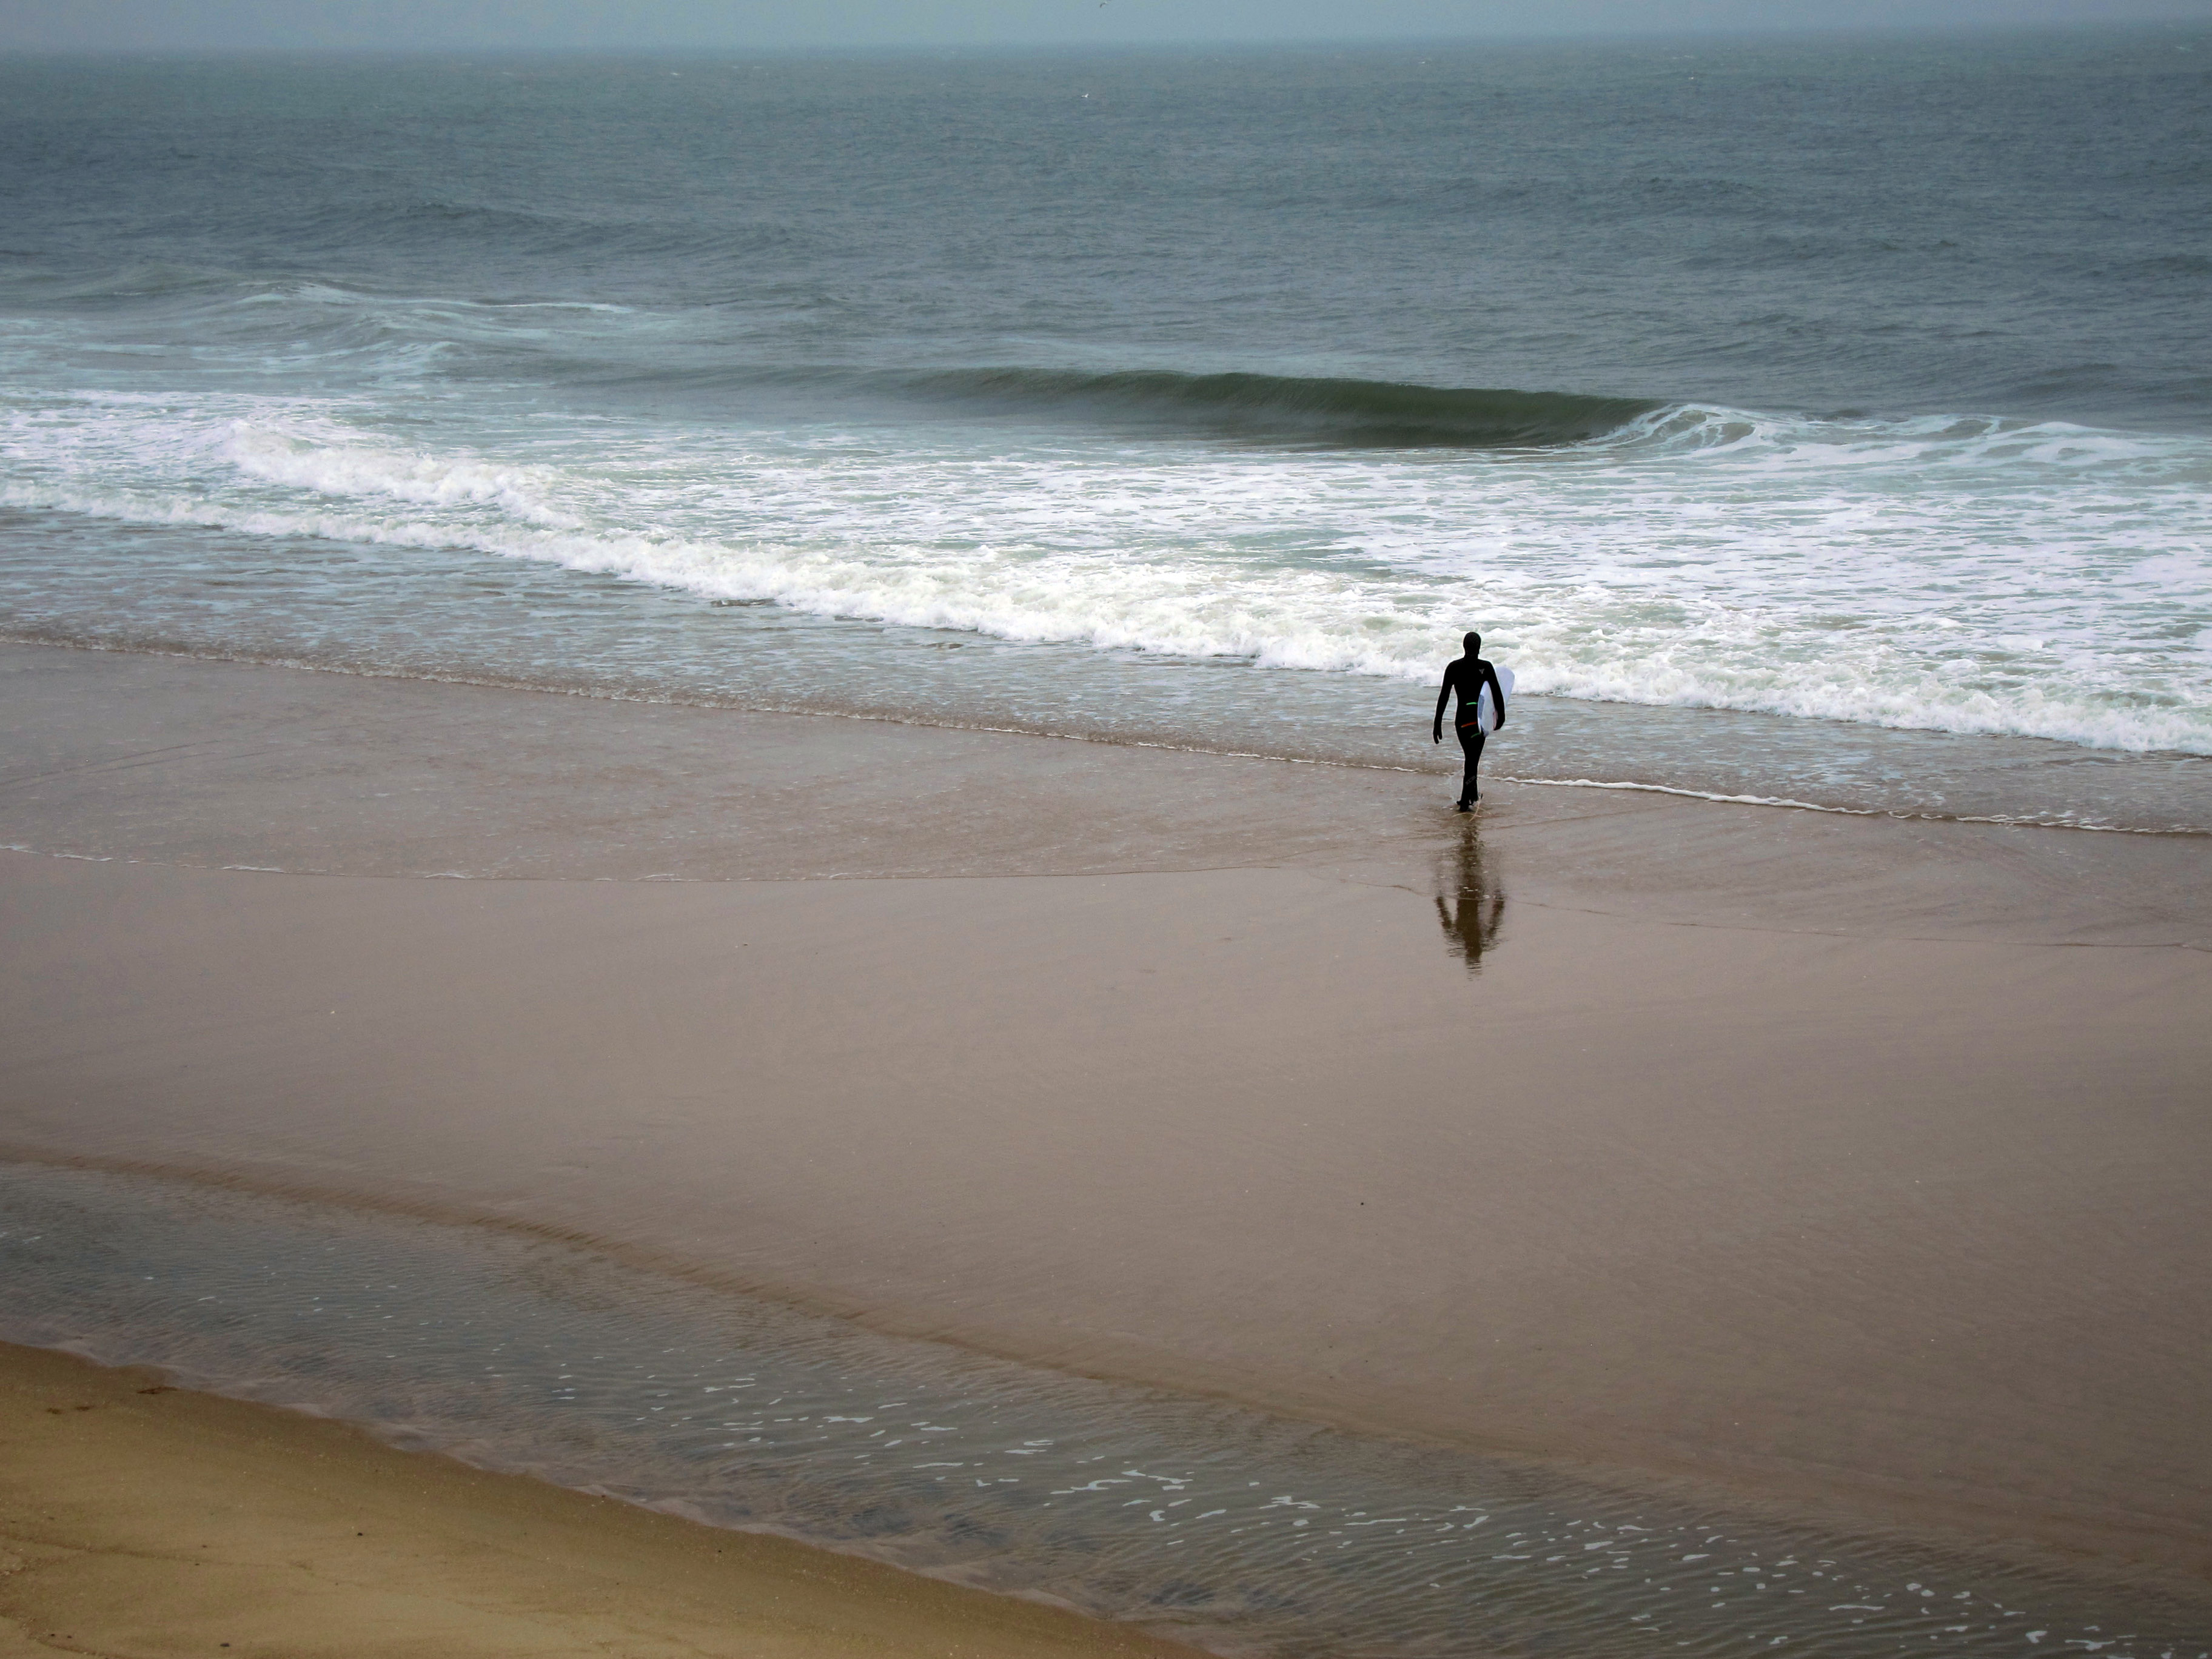 On the beach in Ocean City, MD